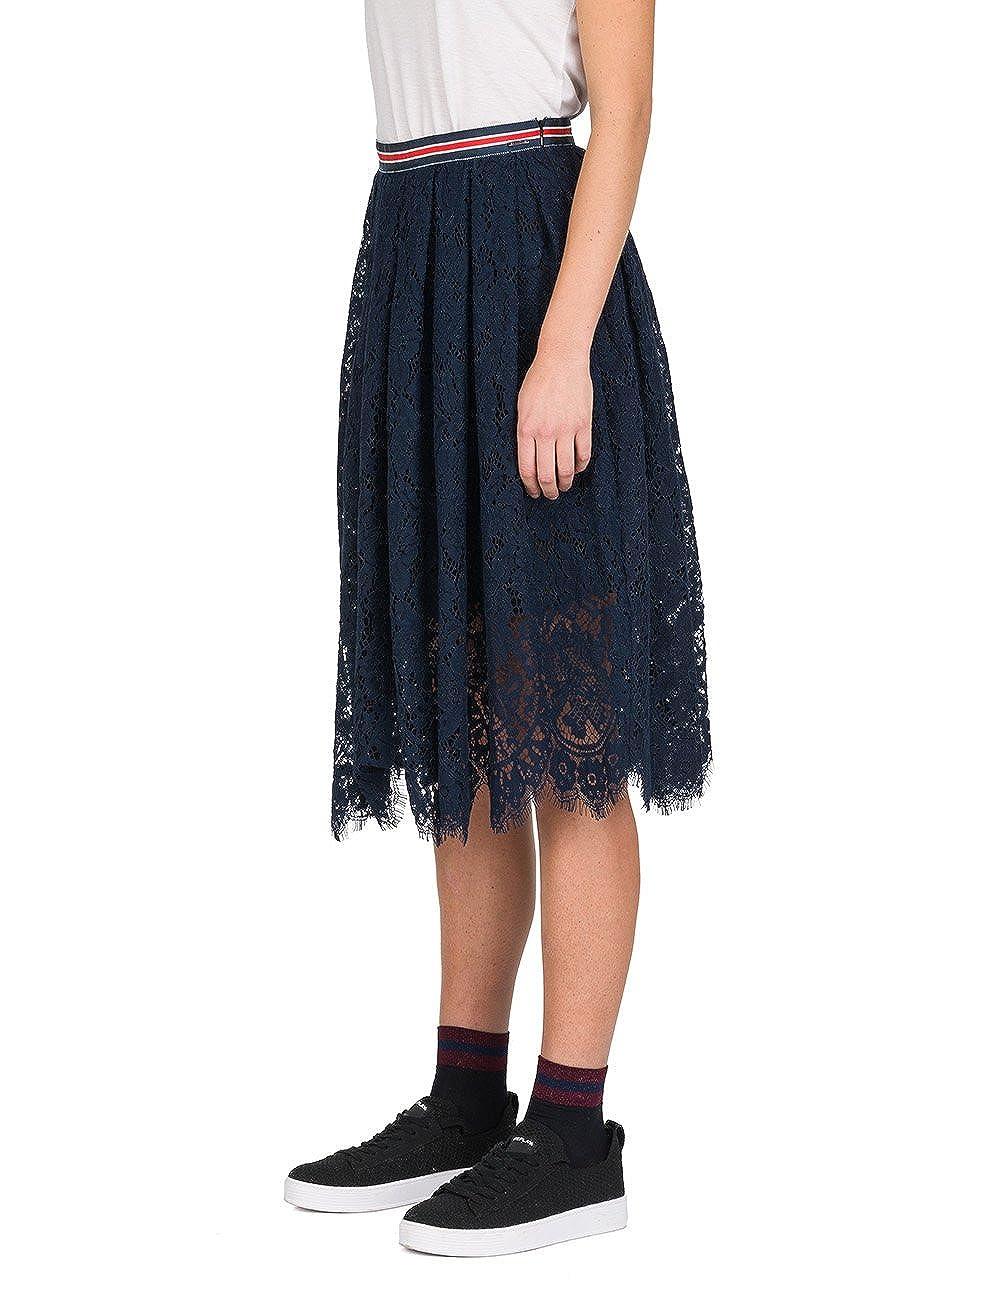 REPLAY Falda para Mujer